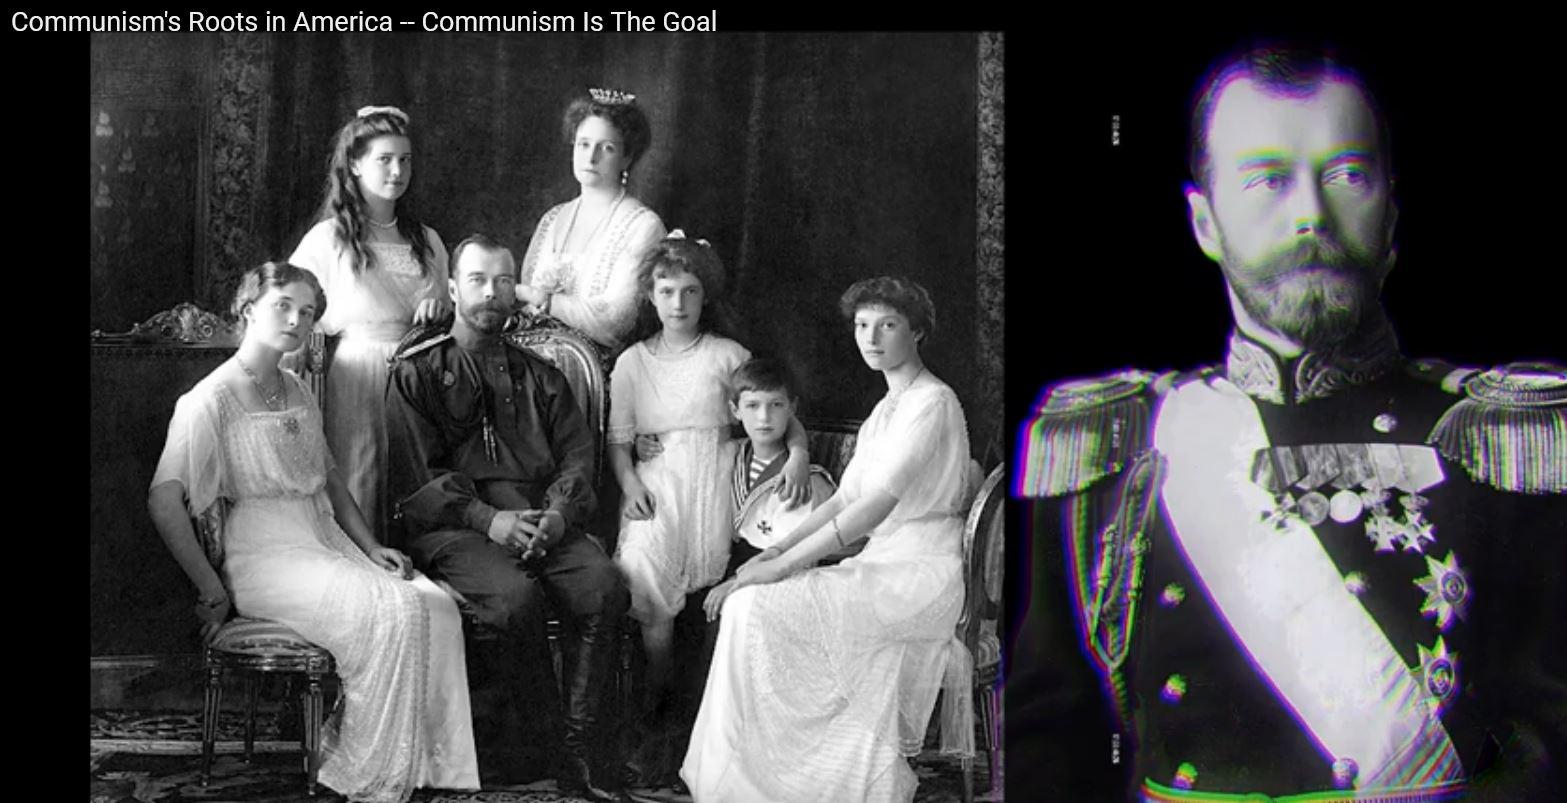 Communism's Roots in America